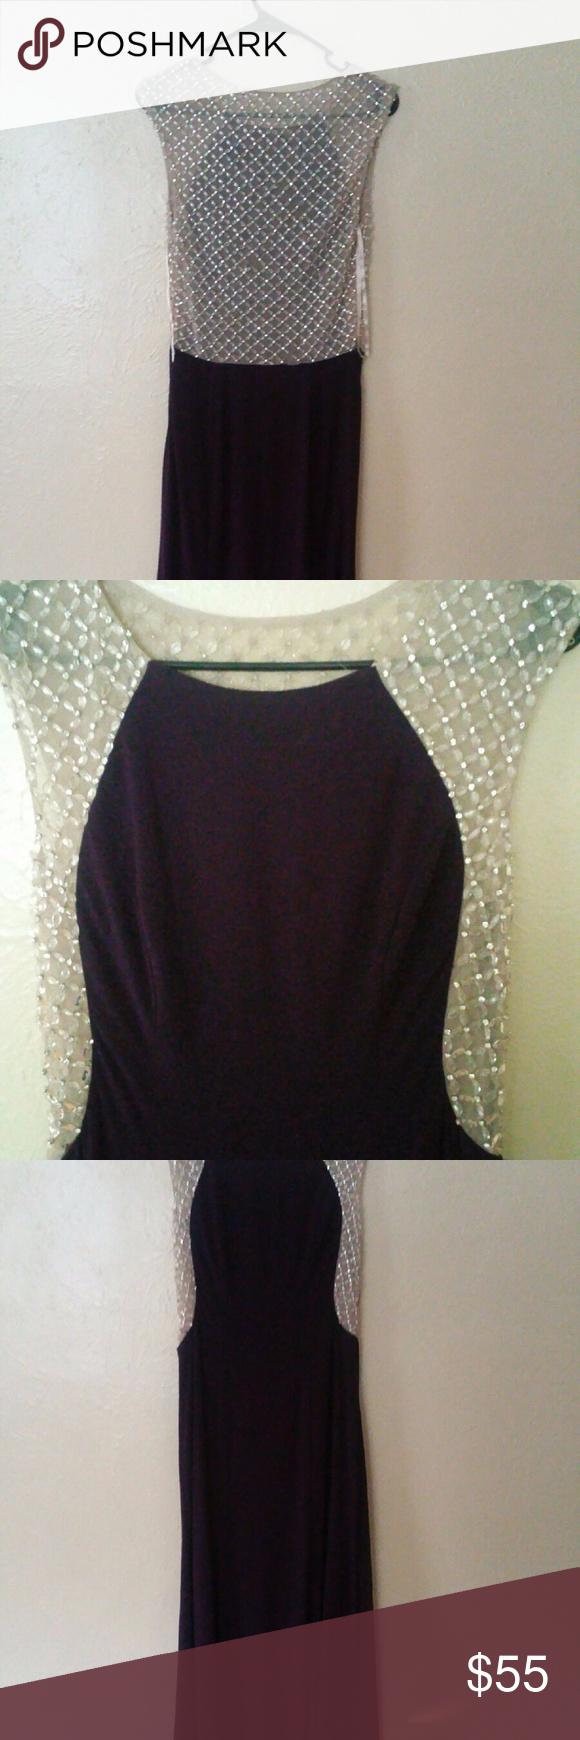 Xscape Evening Gown or Prom Dress | My Posh Picks | Pinterest